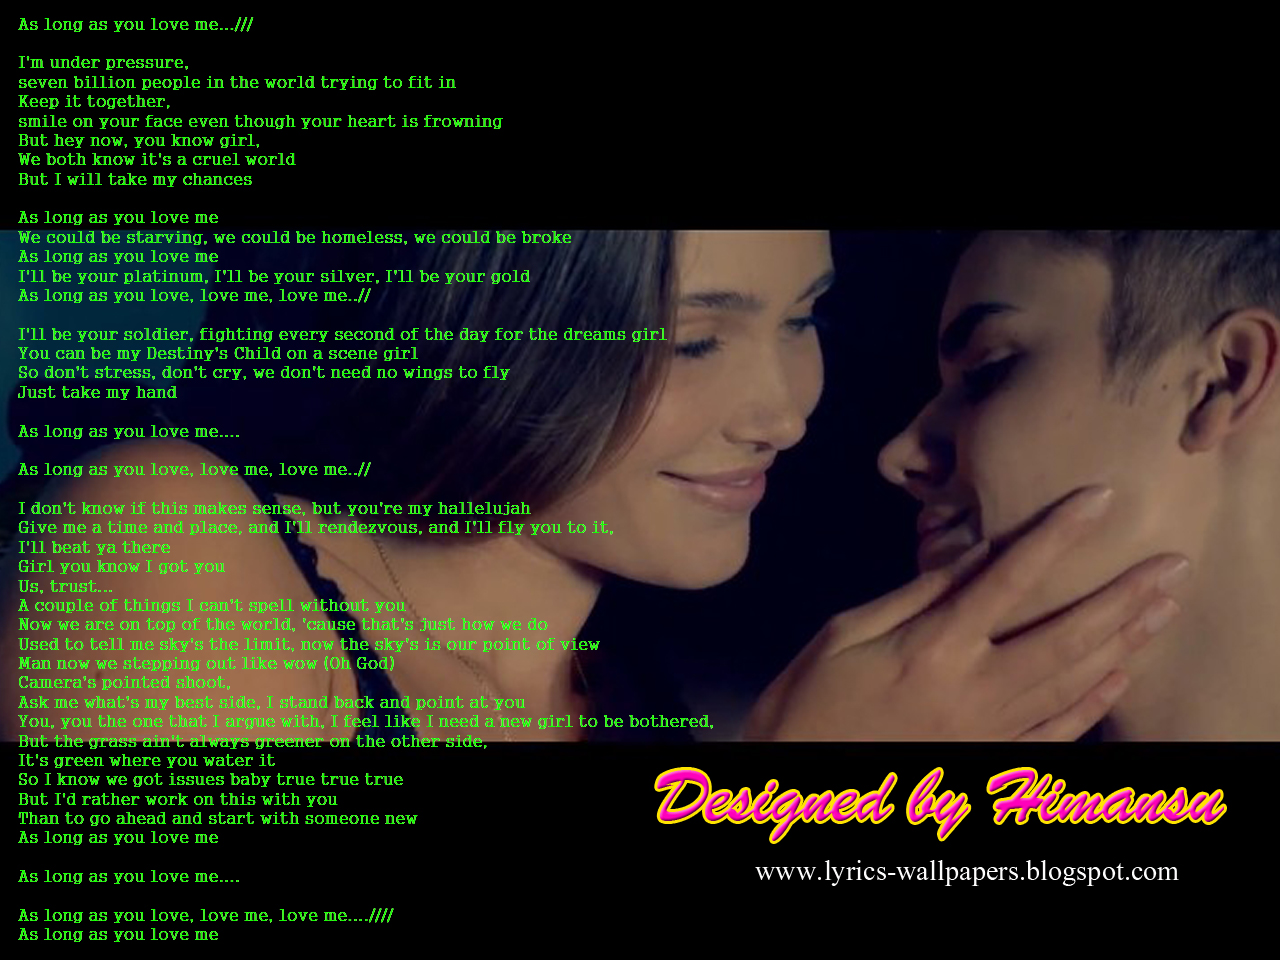 Lyrics Wallpapers   Justin Bieber   As Long As You Love Me 1280x960